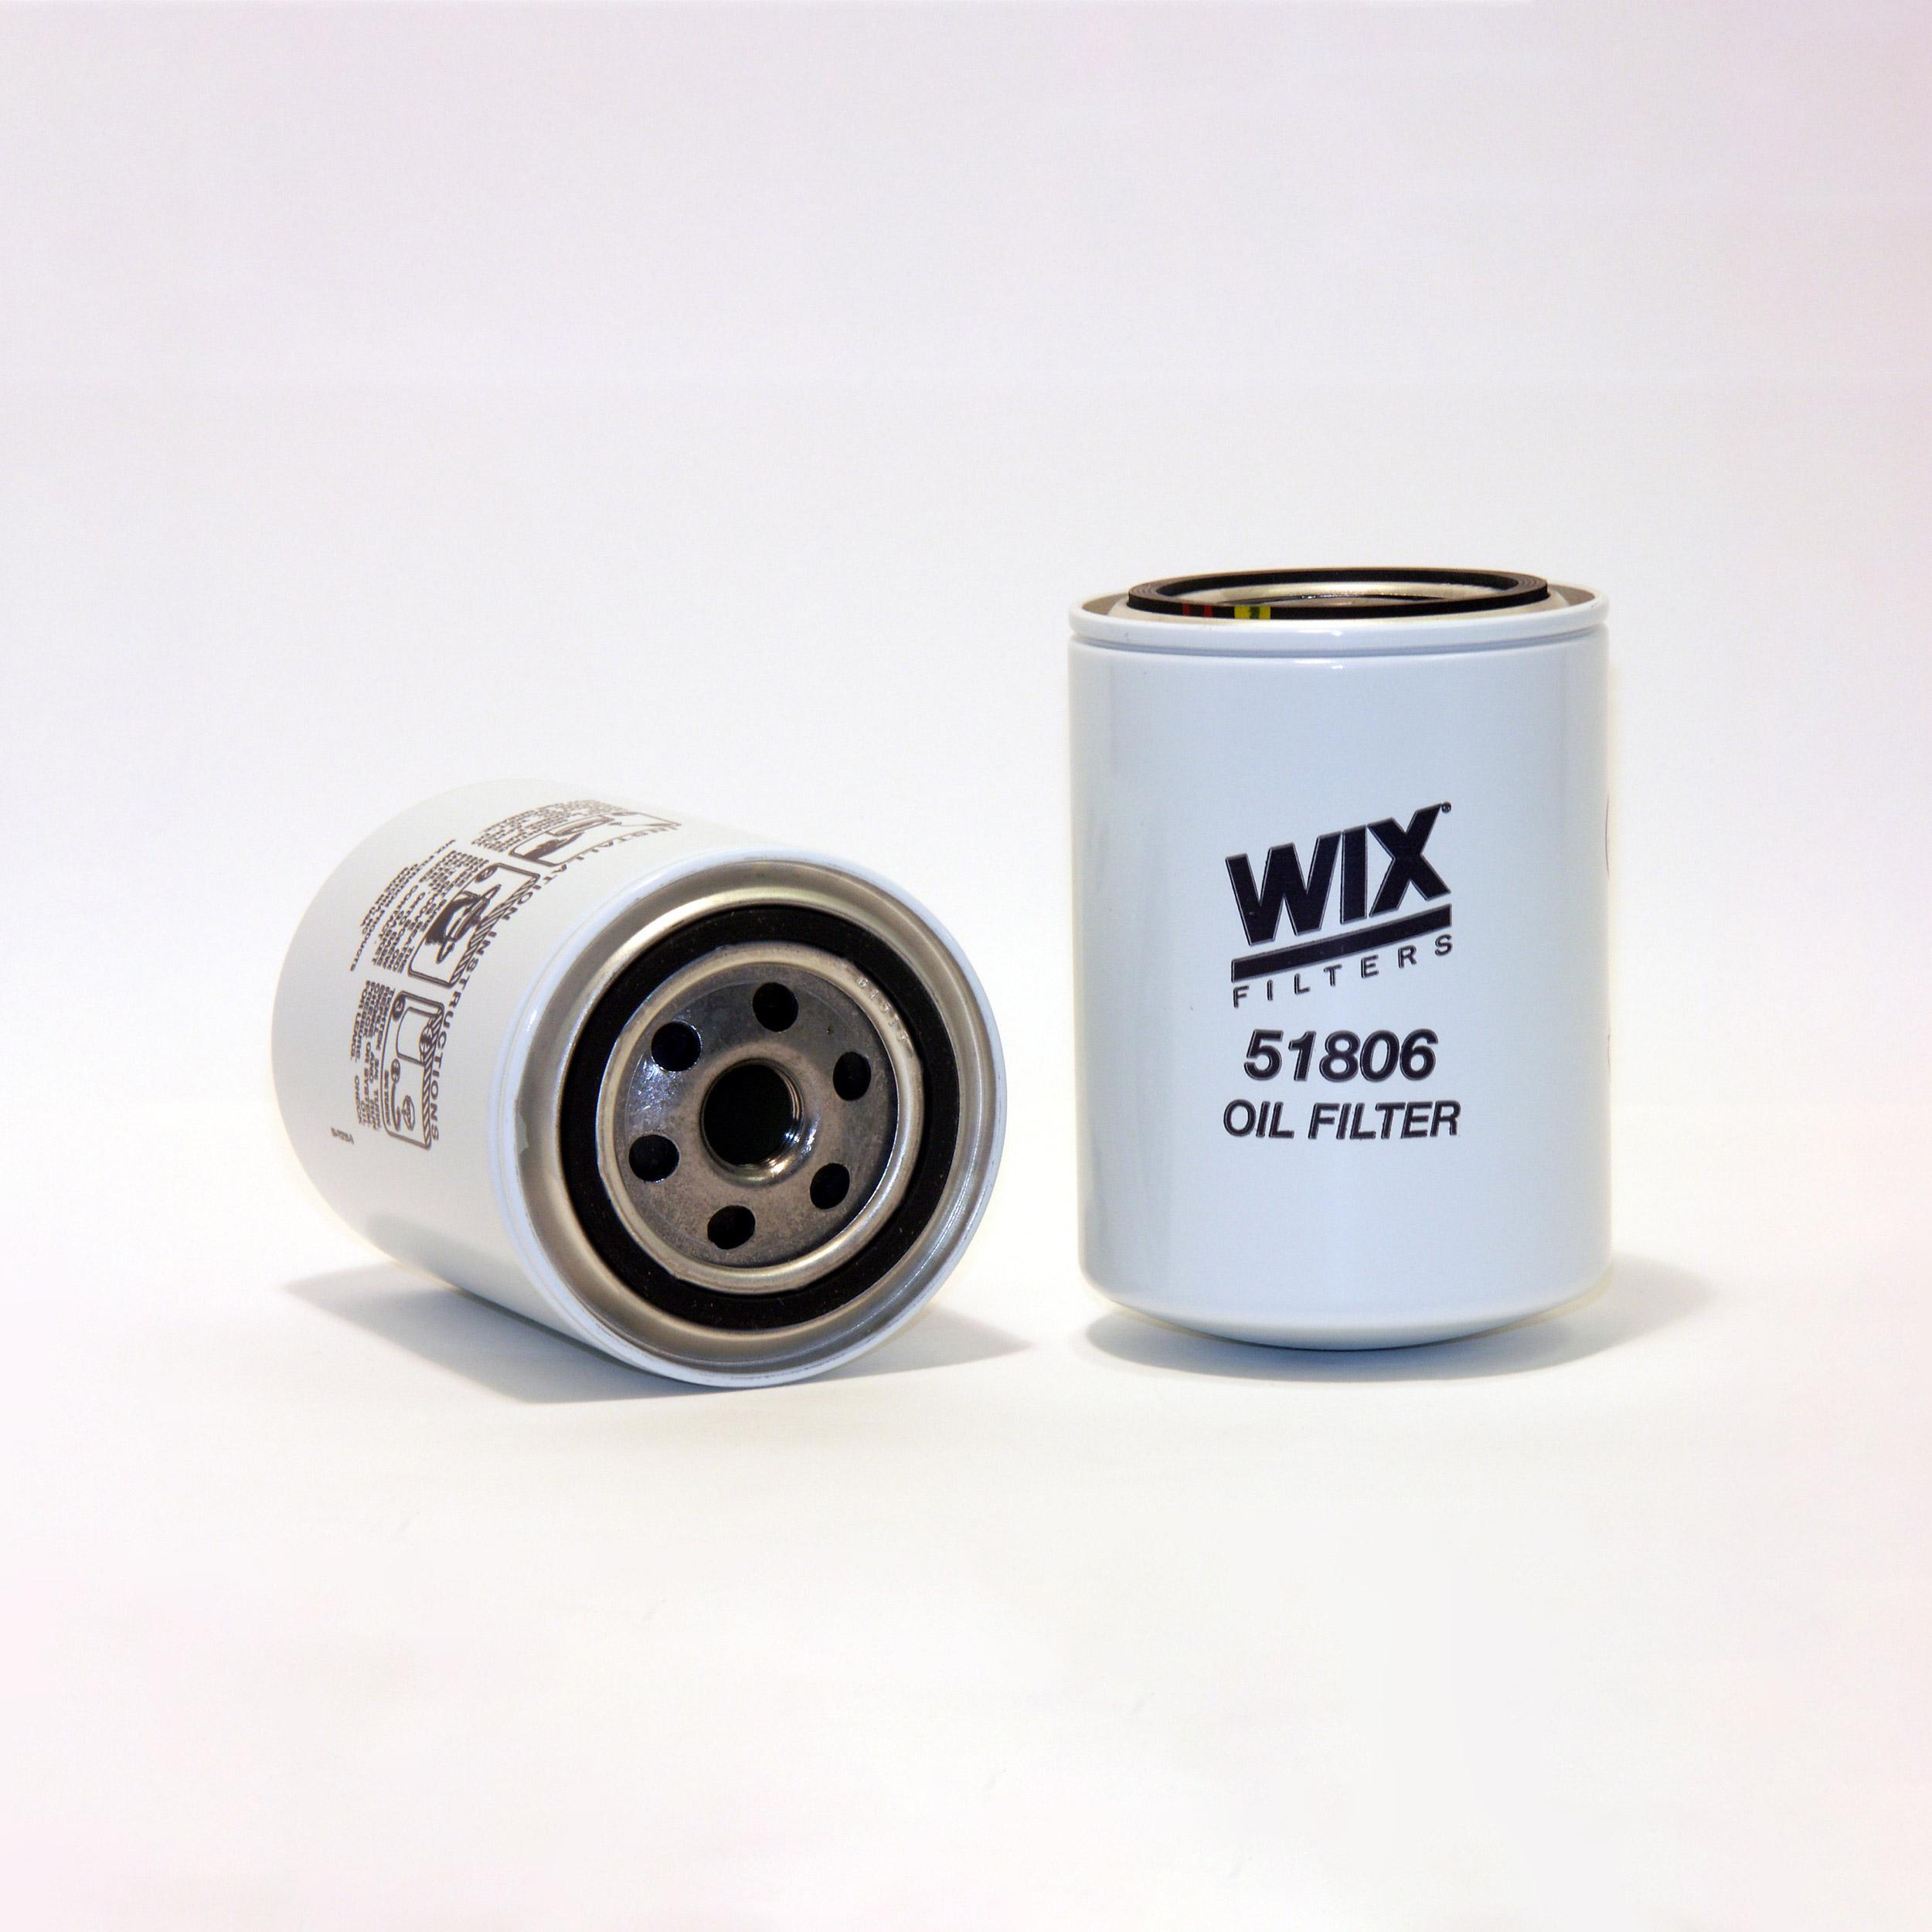 WIX 57000 Oil Filter